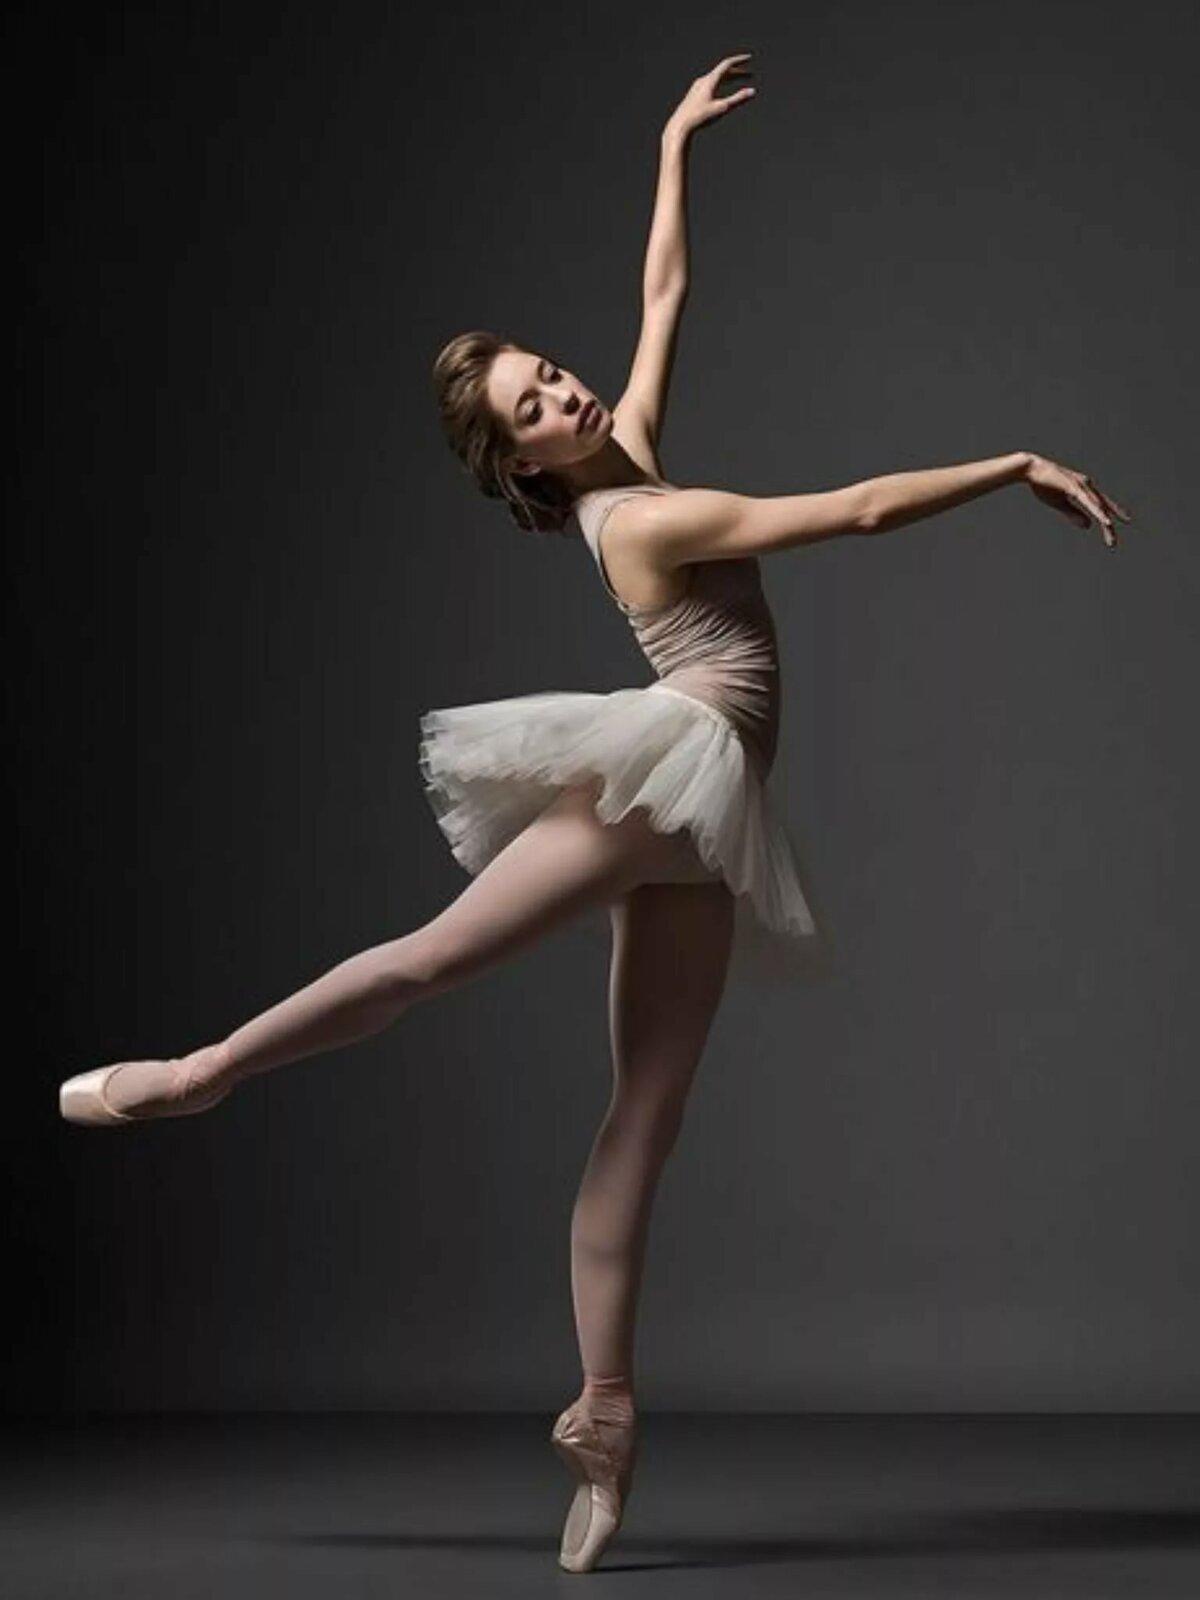 балерина юлтыева фото - 6